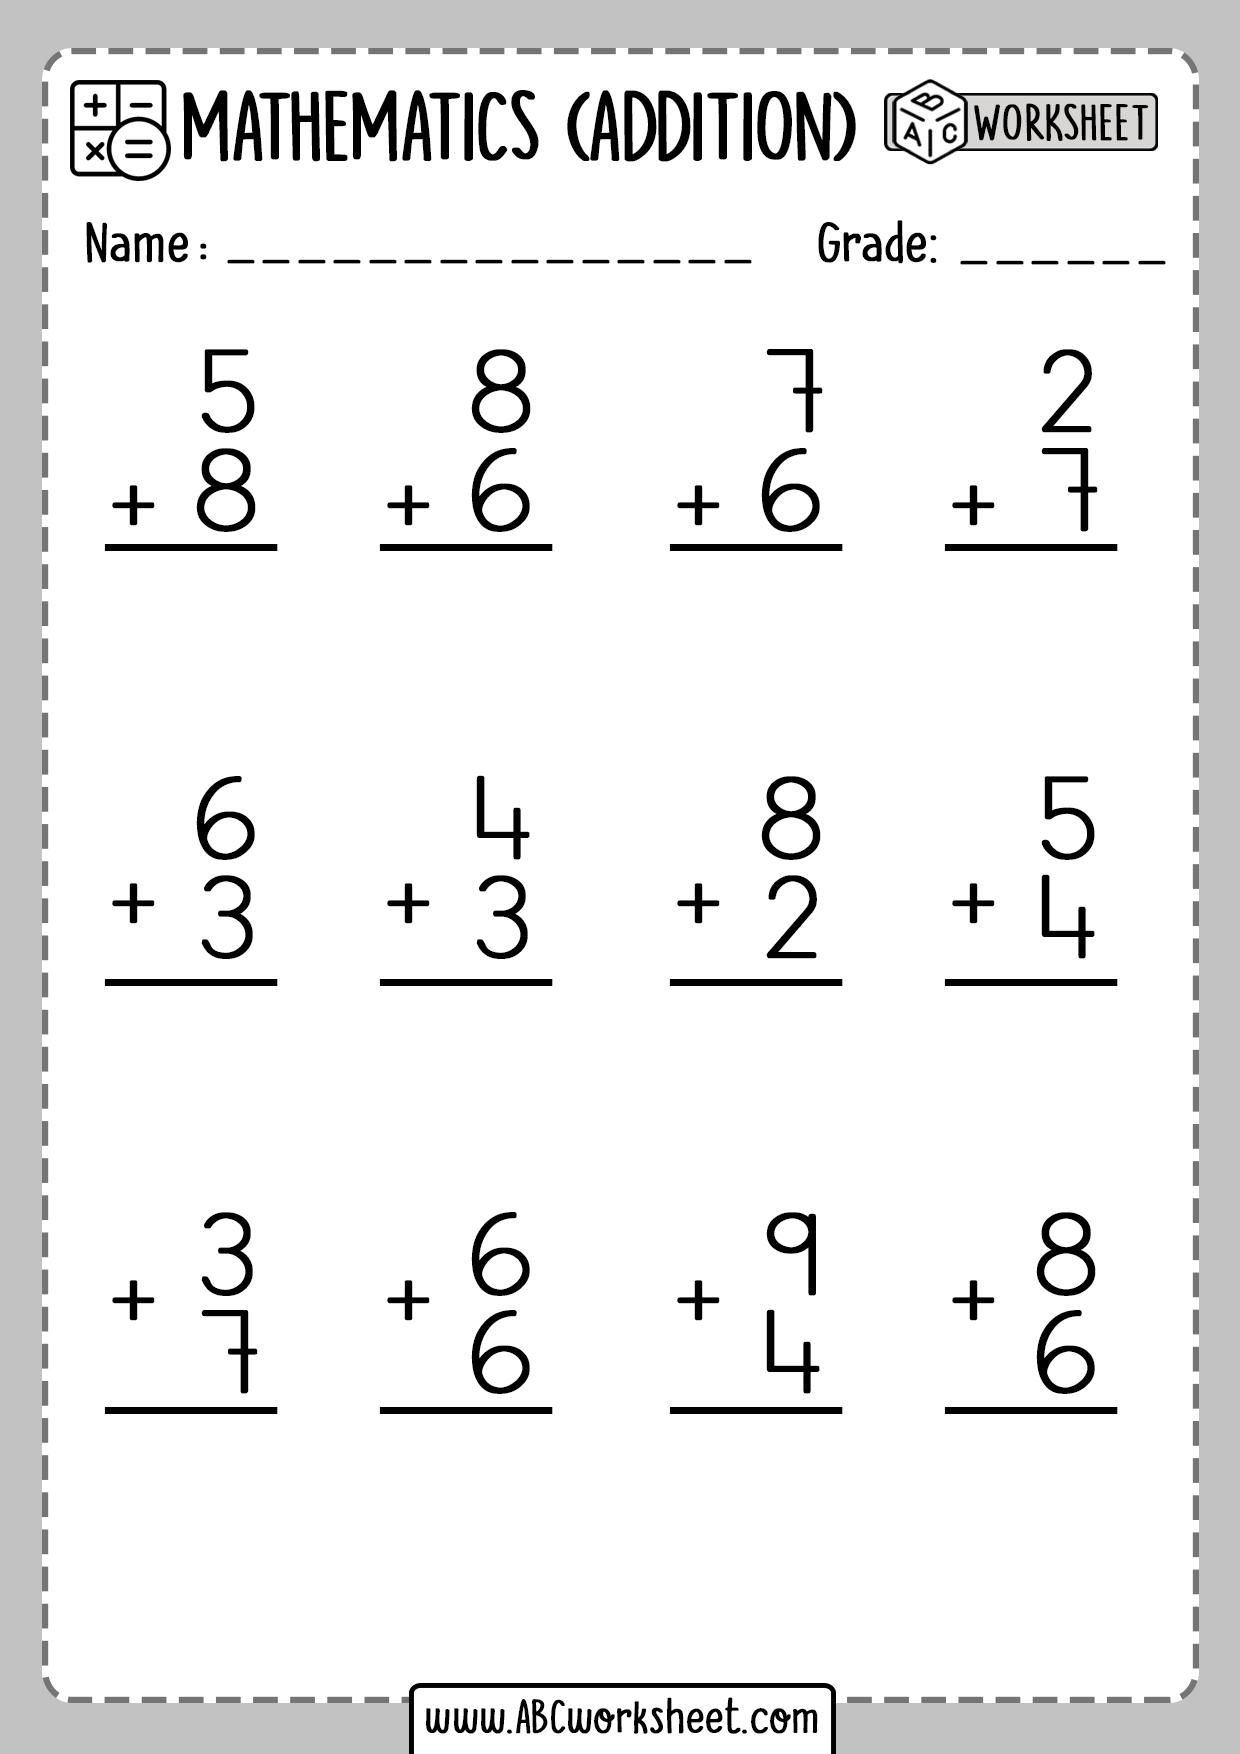 Addition Worksheet First Grade